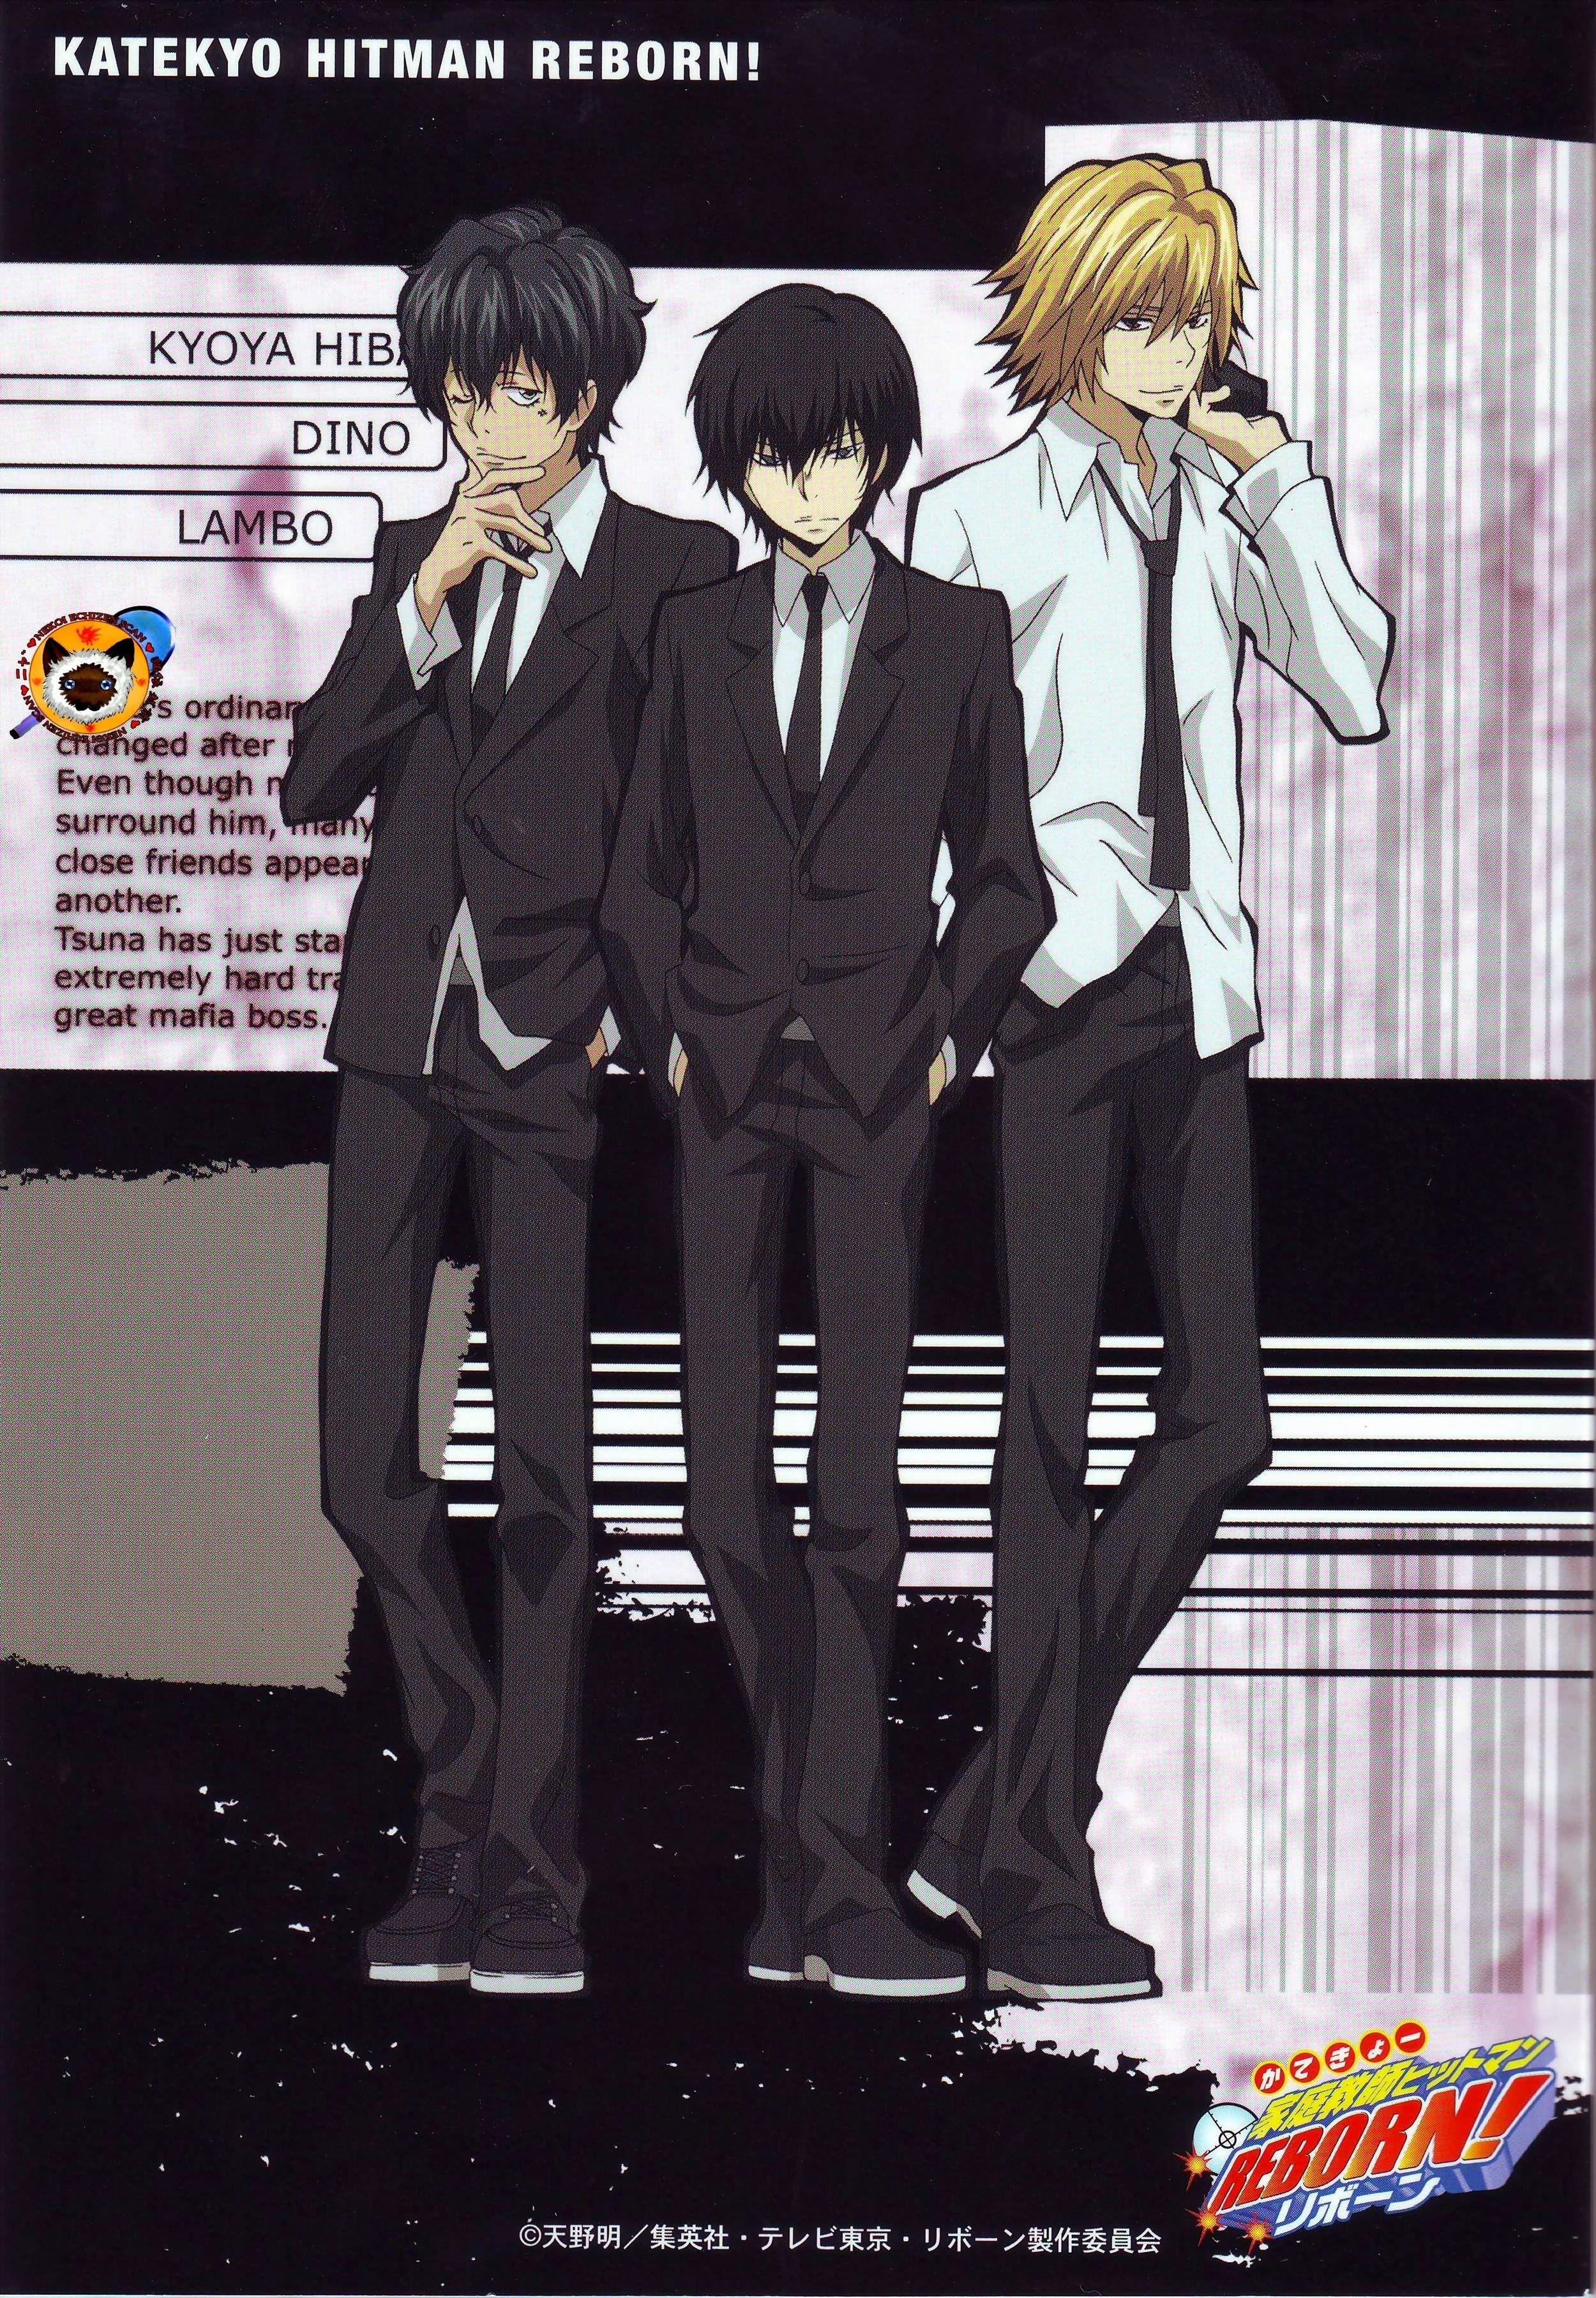 Kyoya Hibari Character Katekyo Hitman Reborn Series Kyoya